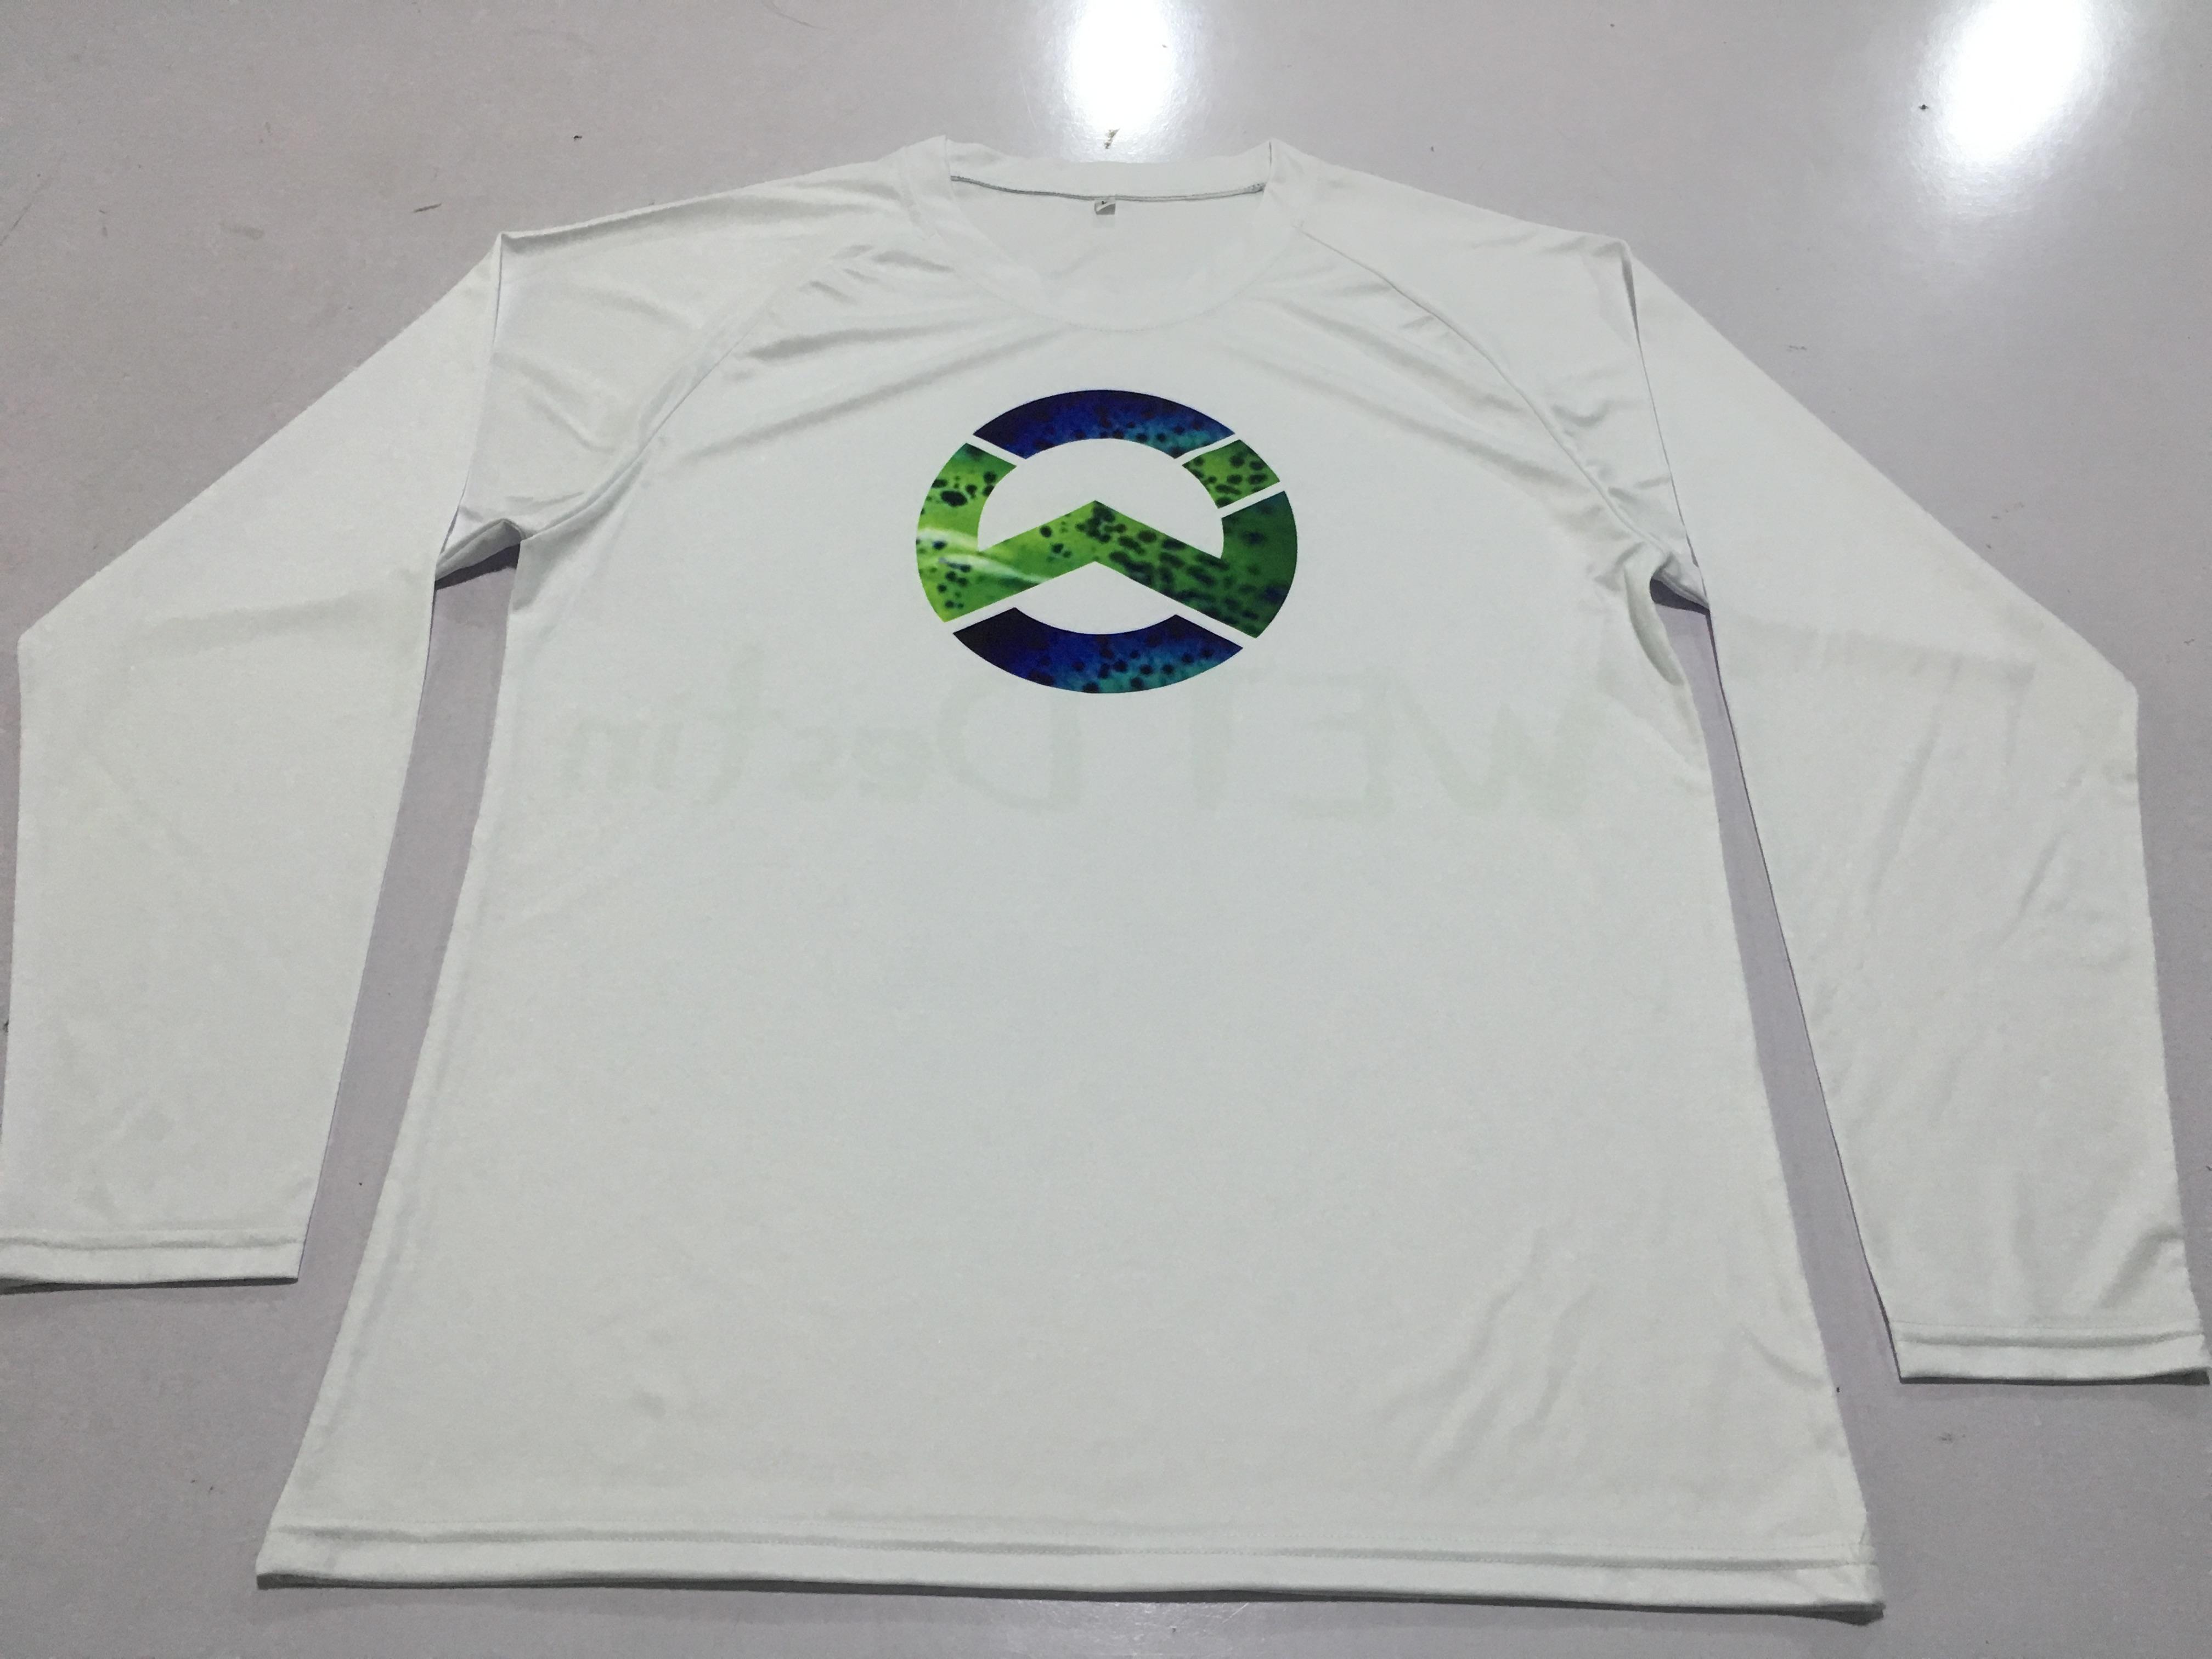 Wholesale Sublimation Design Your Own Tournament Fishing Shirt